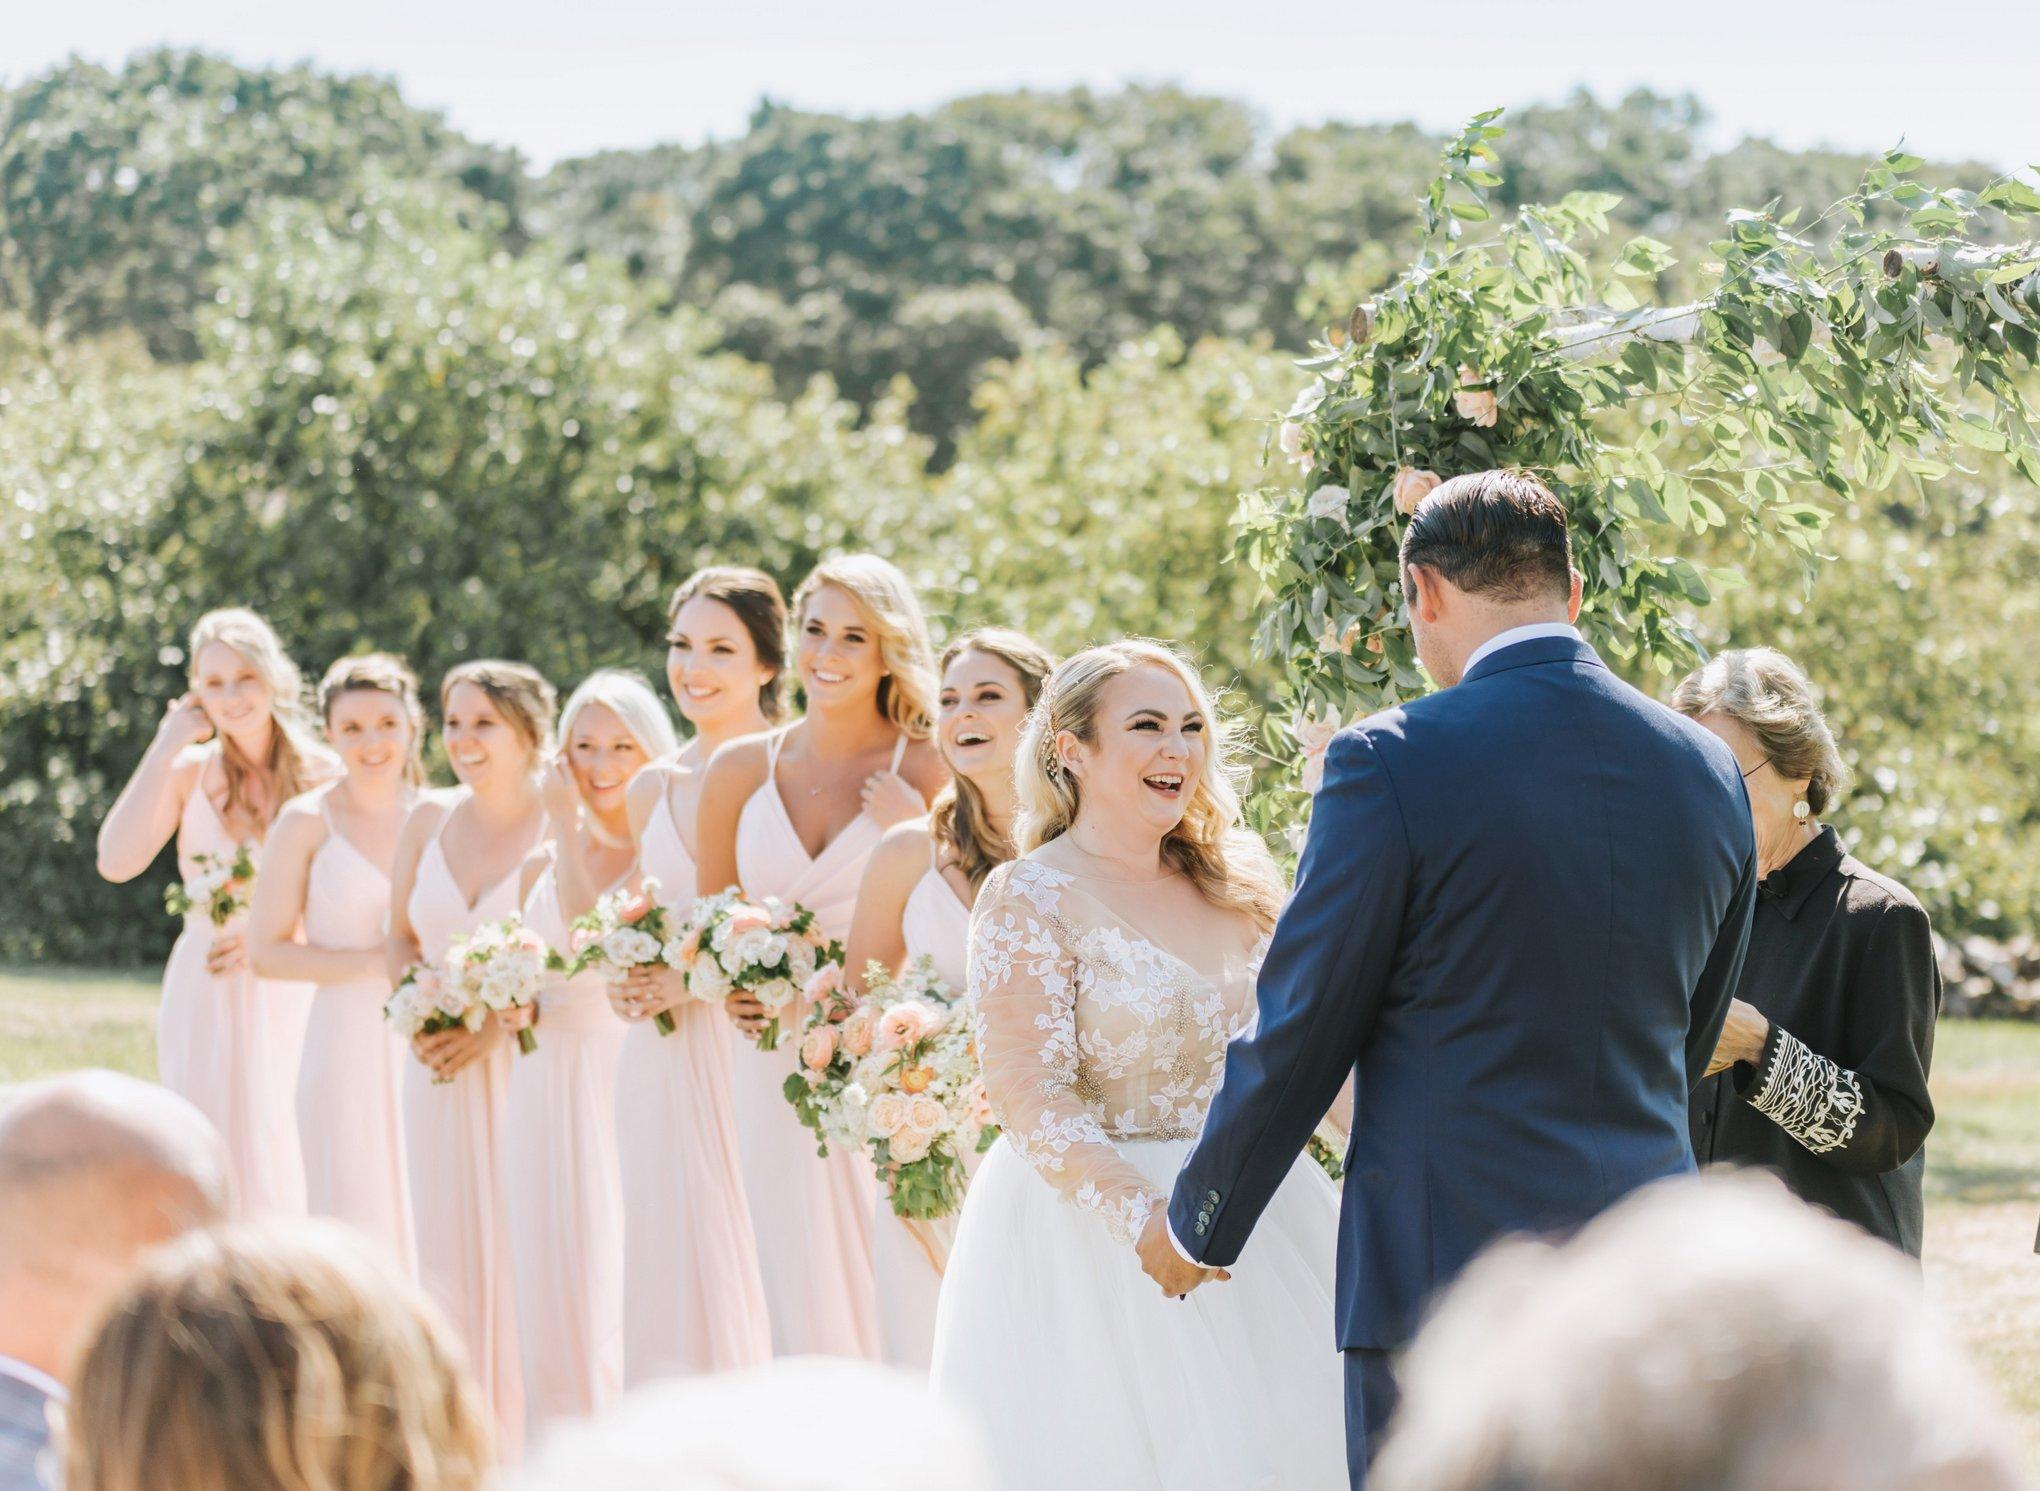 Marthas-Vineyard-Wedding-Photographer-Beach-Plum-Inn-21.jpg